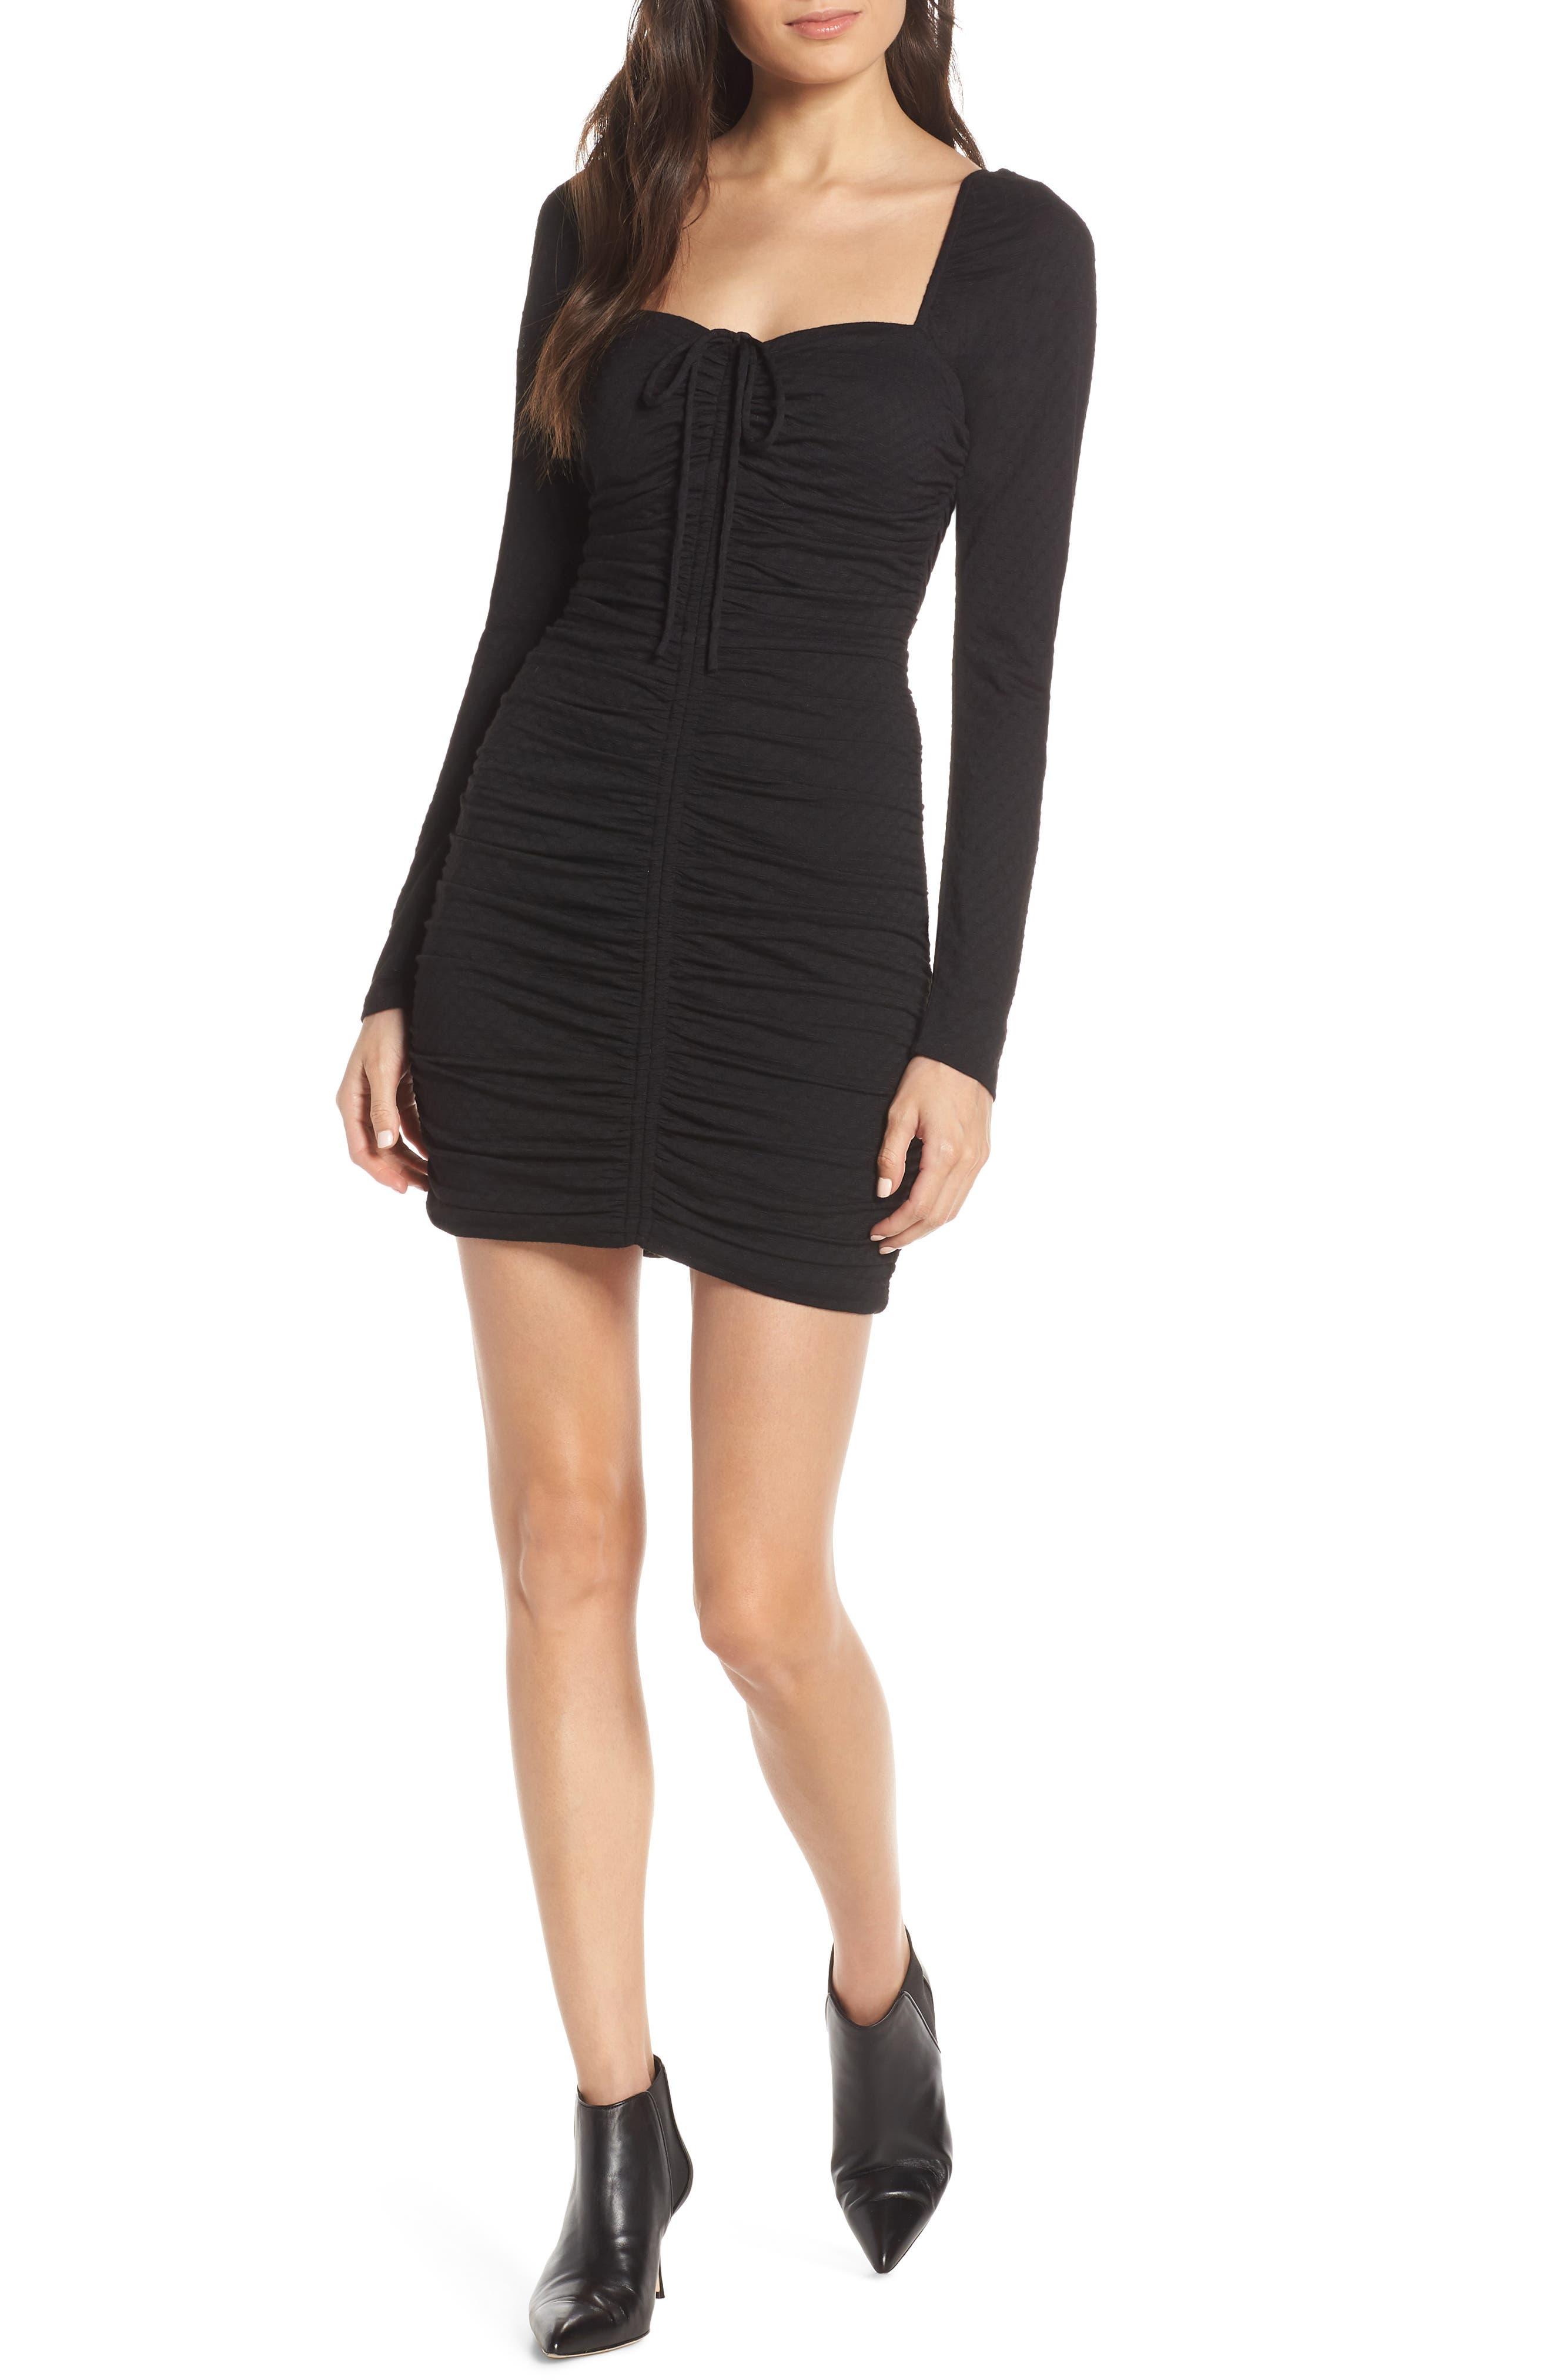 Ali & Jay Ruched Body-Con Dress, Black